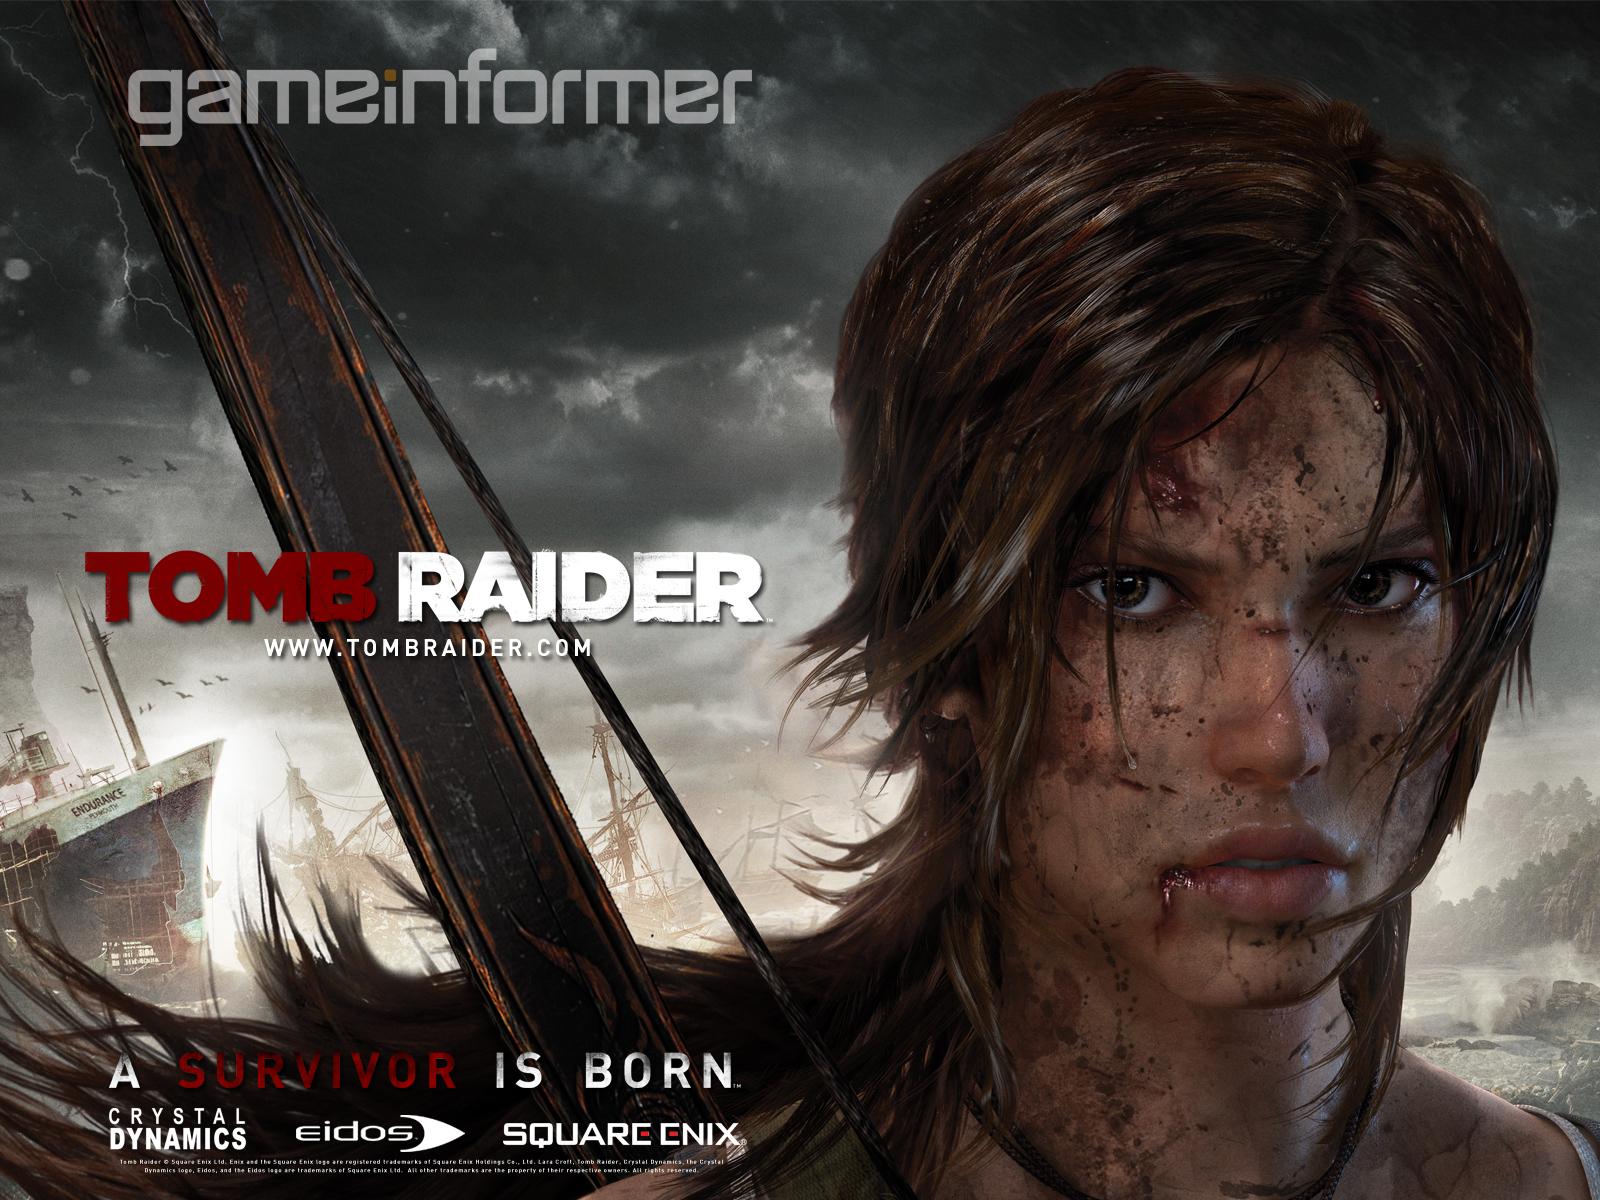 Lara's new look